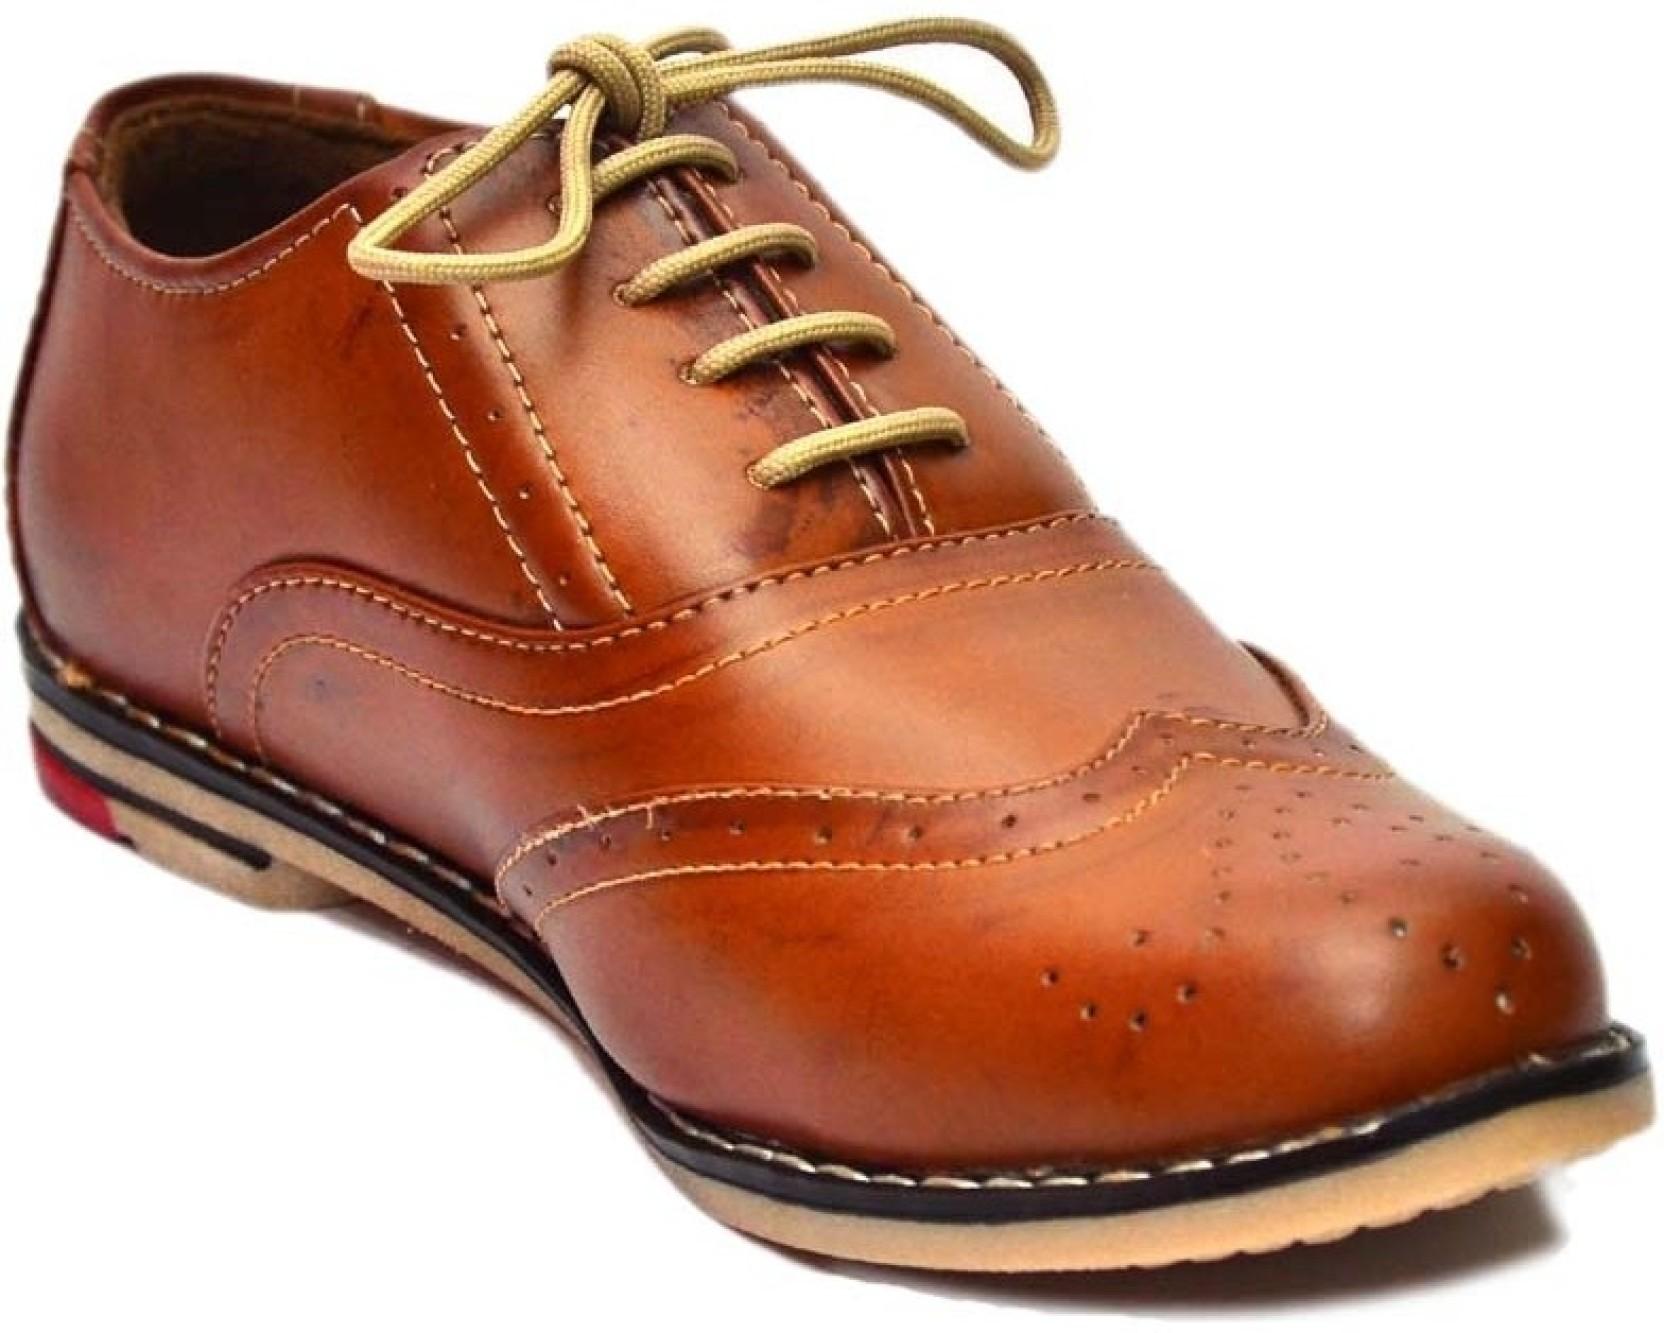 Vogue Guys Brock Shoes Casual Shoes Buy Tan Color Vogue Guys Brock Shoes Casual Shoes Online